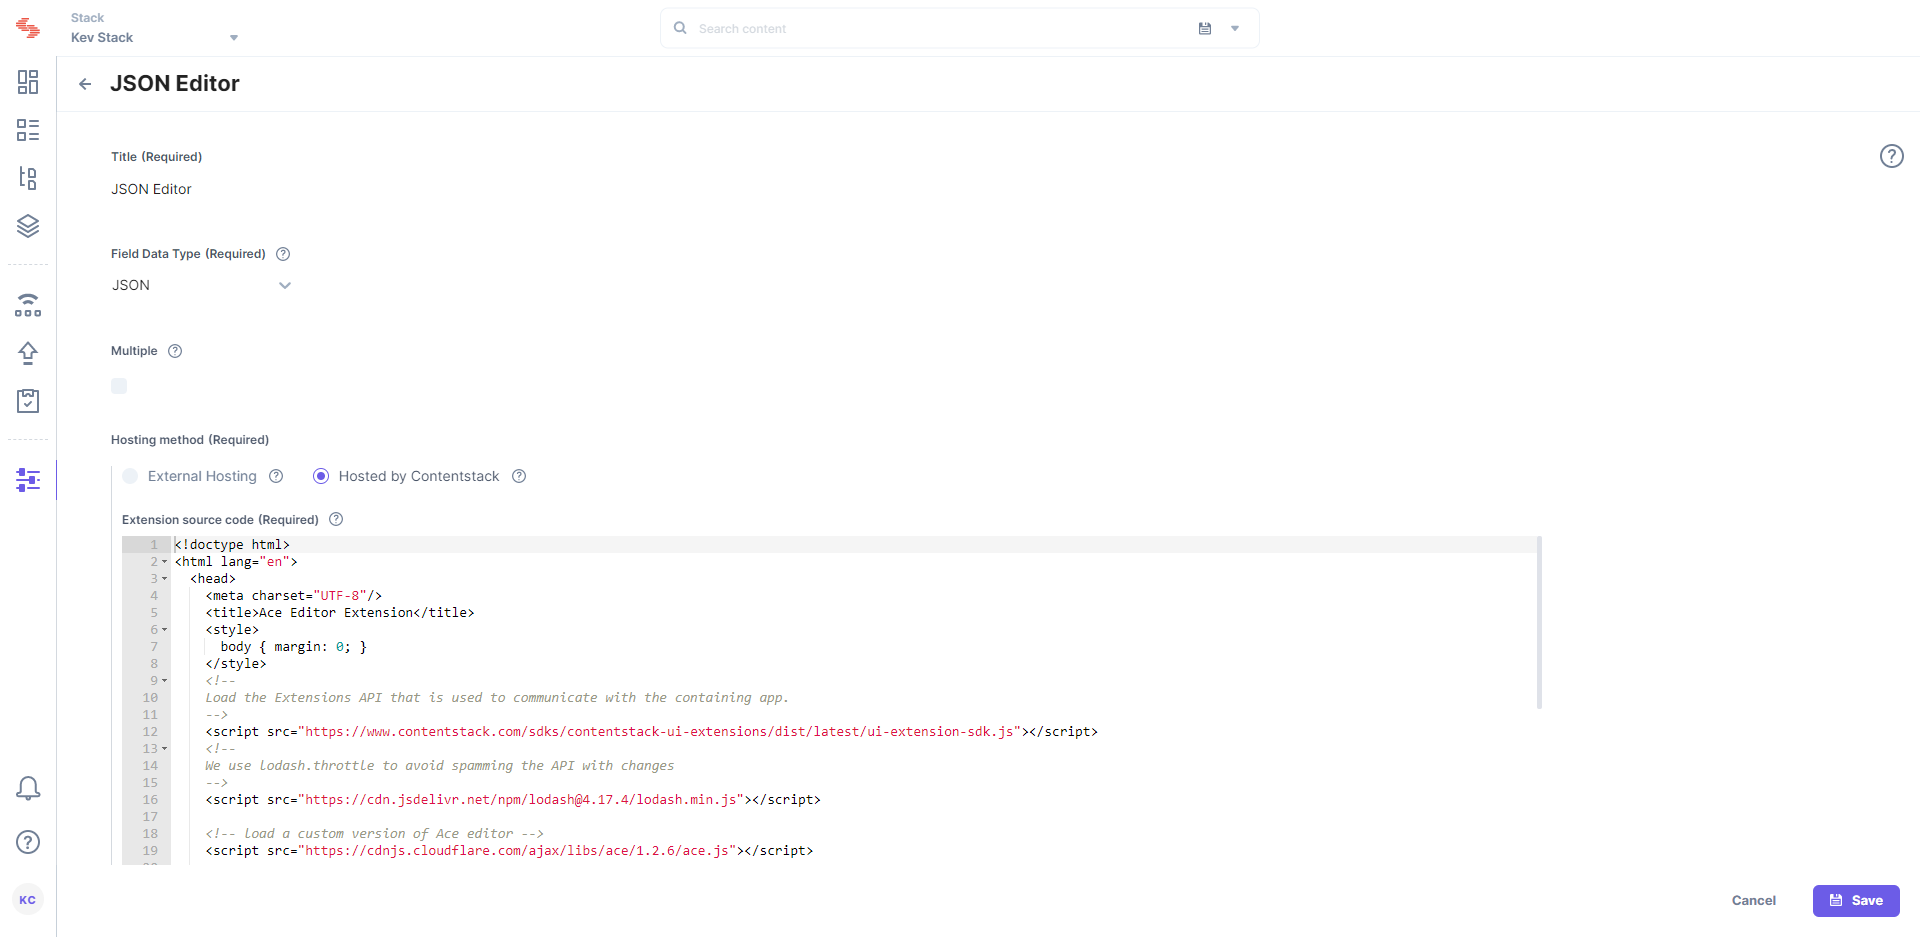 JSON_Editor_3_no_highlight.png